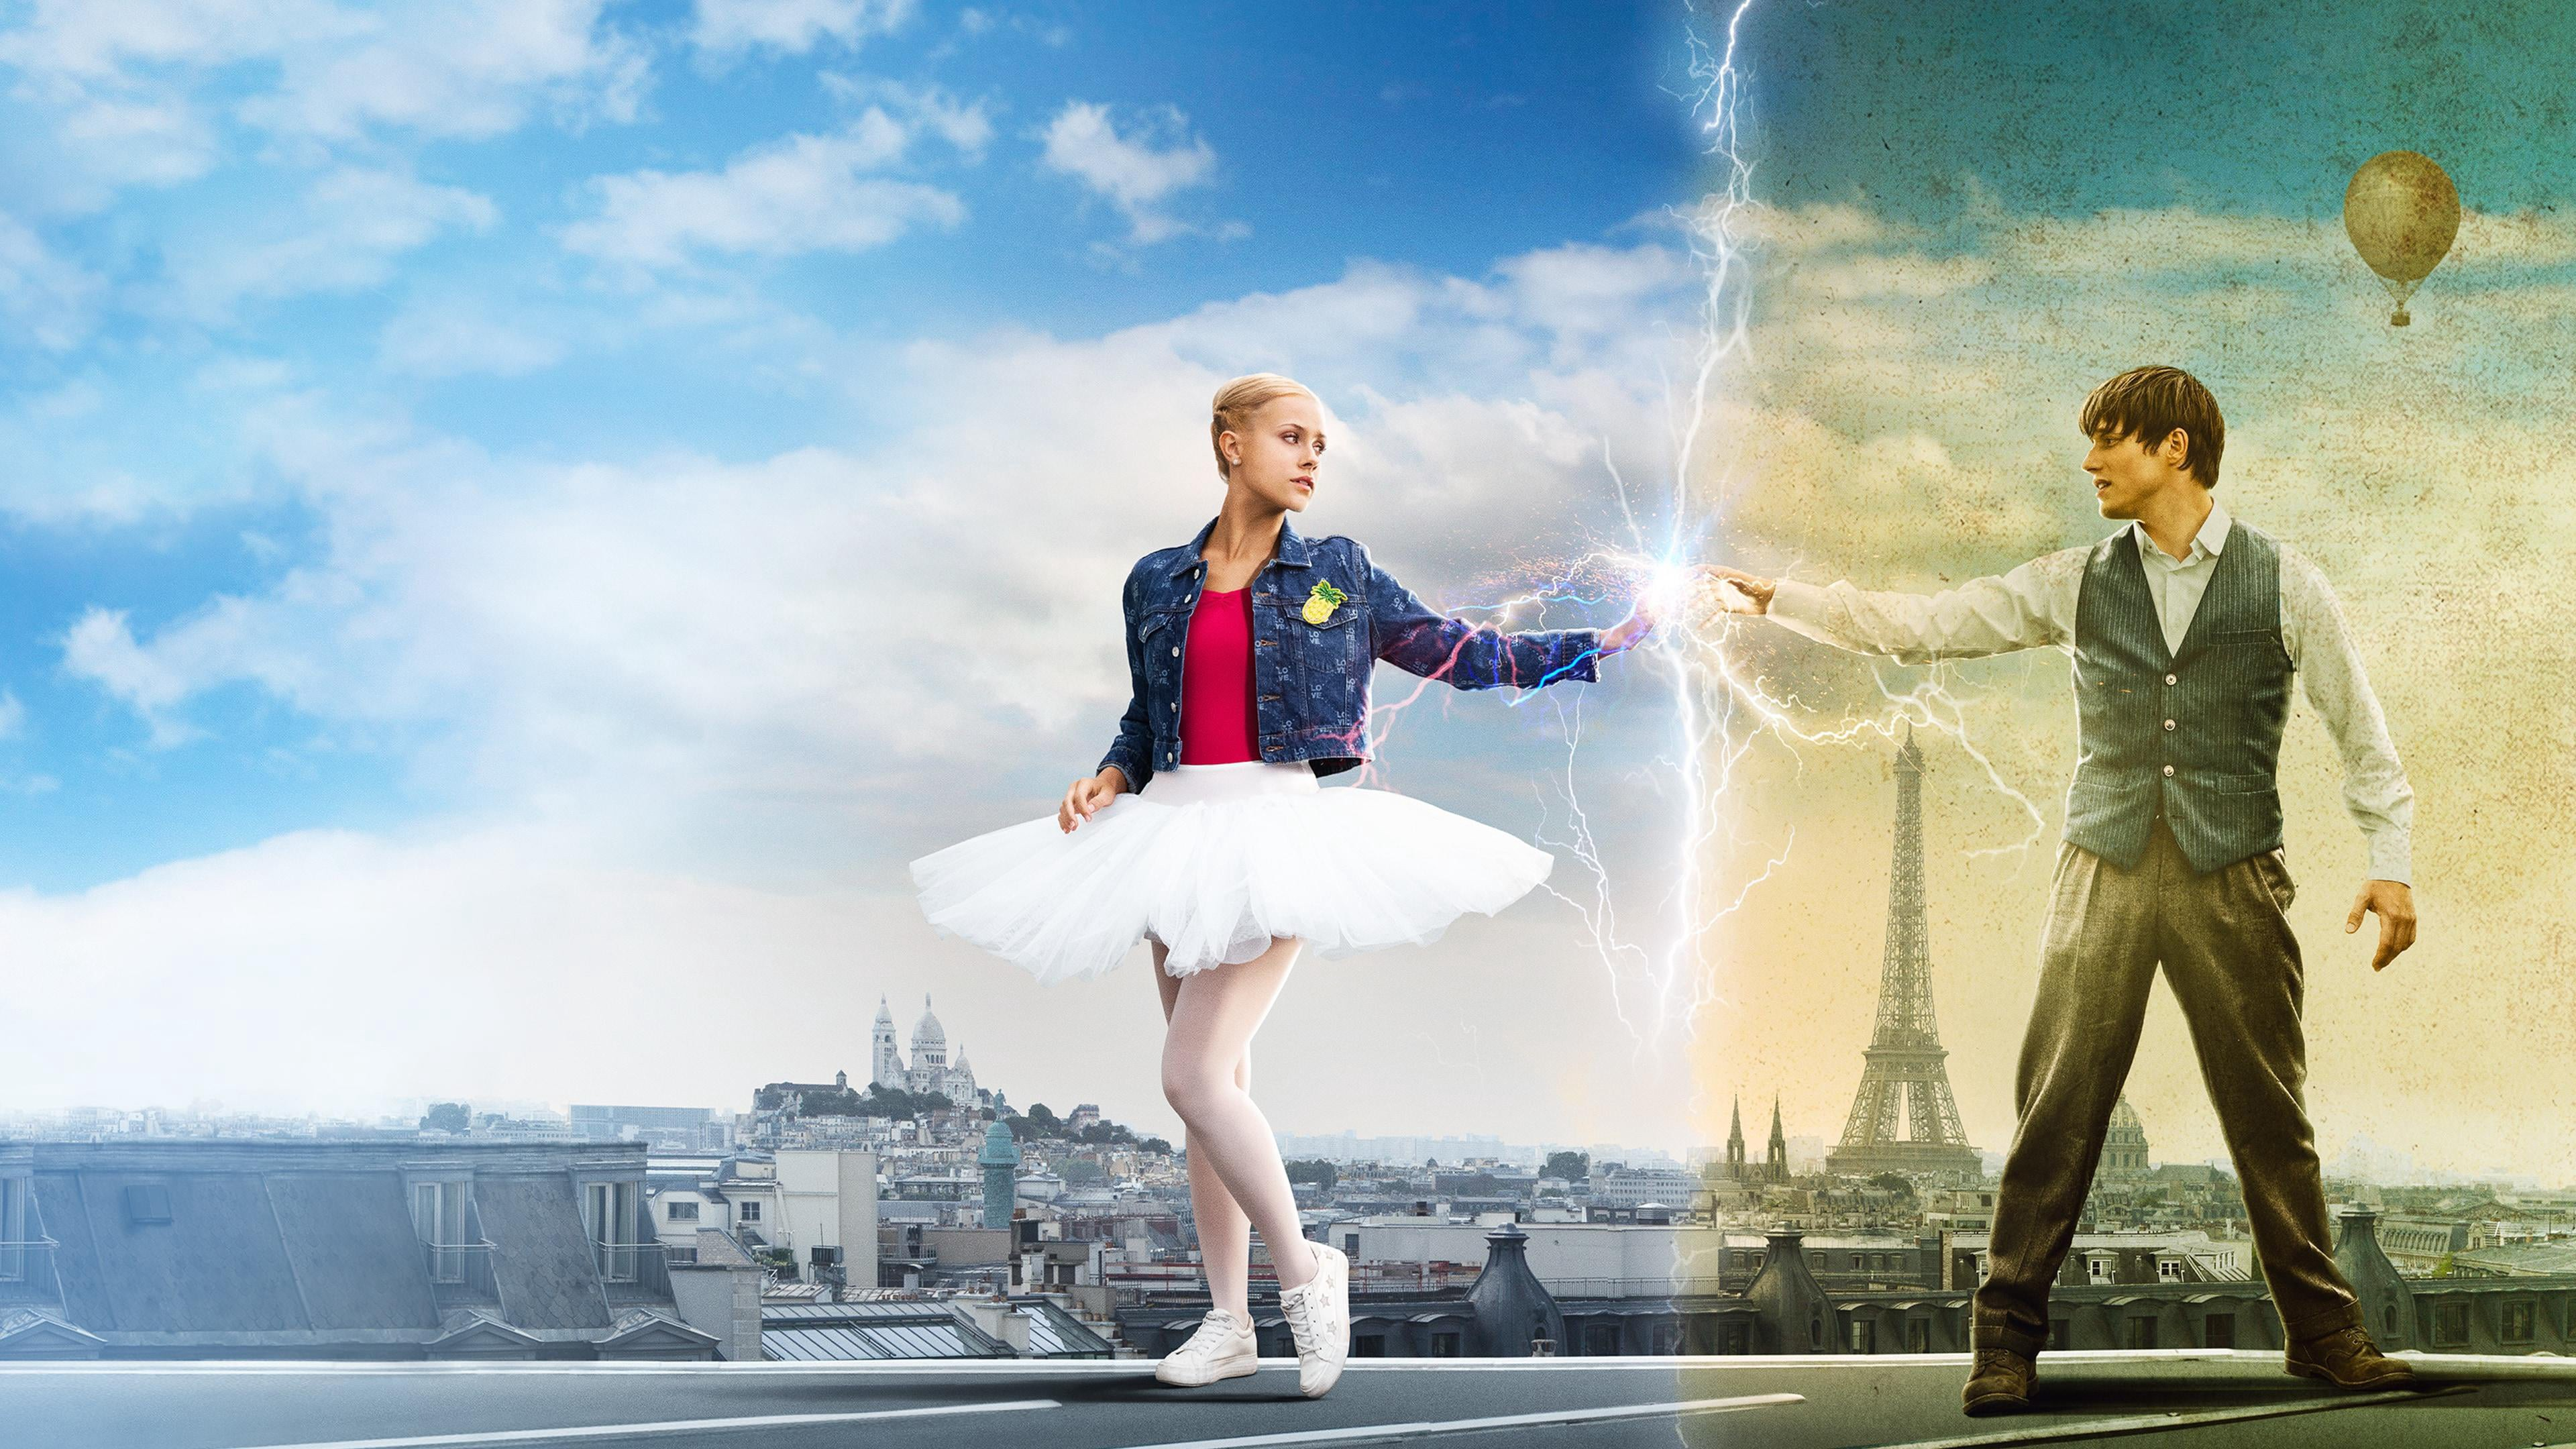 find me in paris season 3 4k 1602452079 - Find Me In Paris Season 3 4k - Find Me In Paris Season 3 4k wallpapers